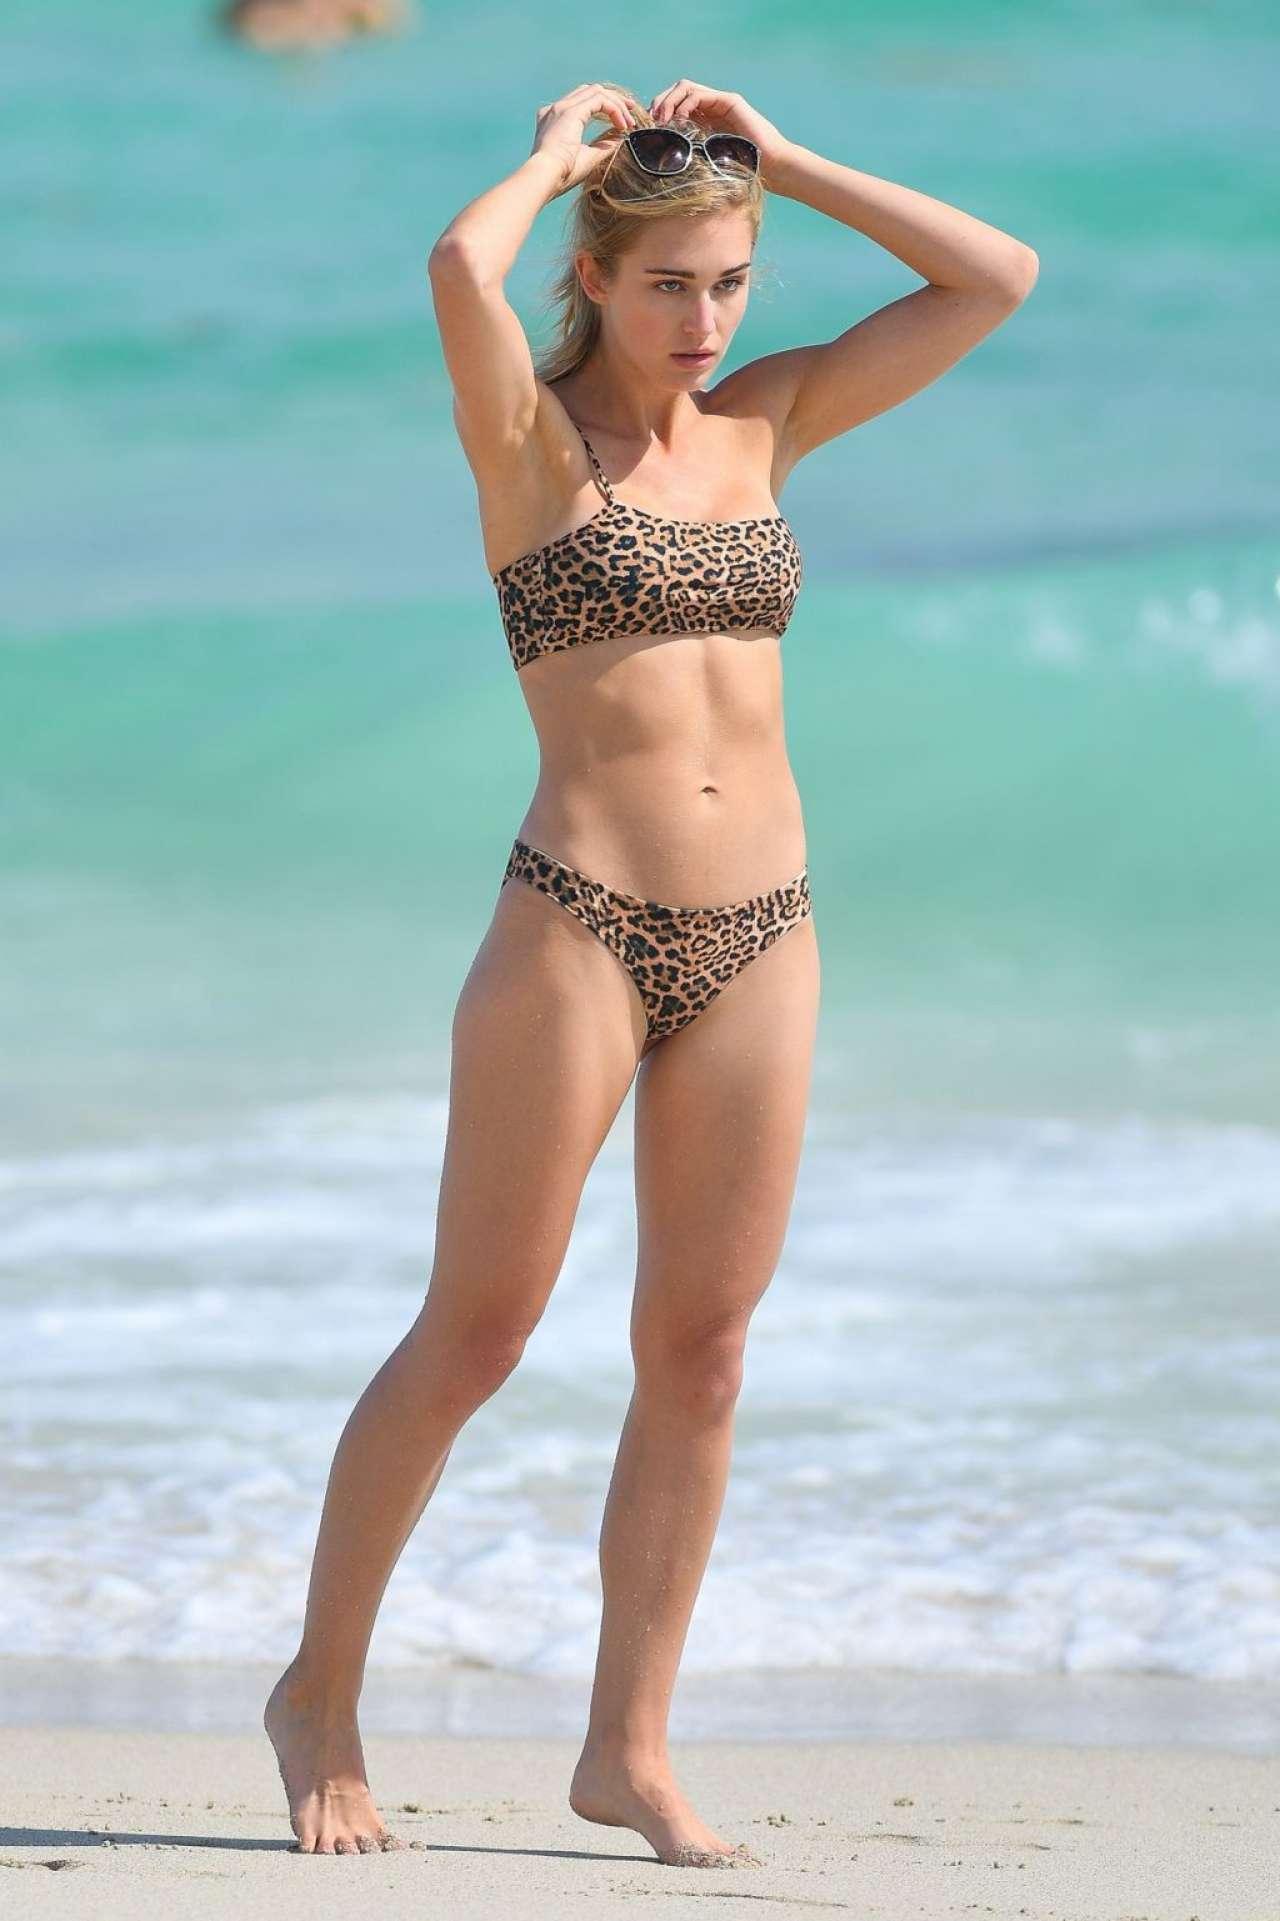 Gilda Joelle Osborn Wears a Leopard Print Bikini